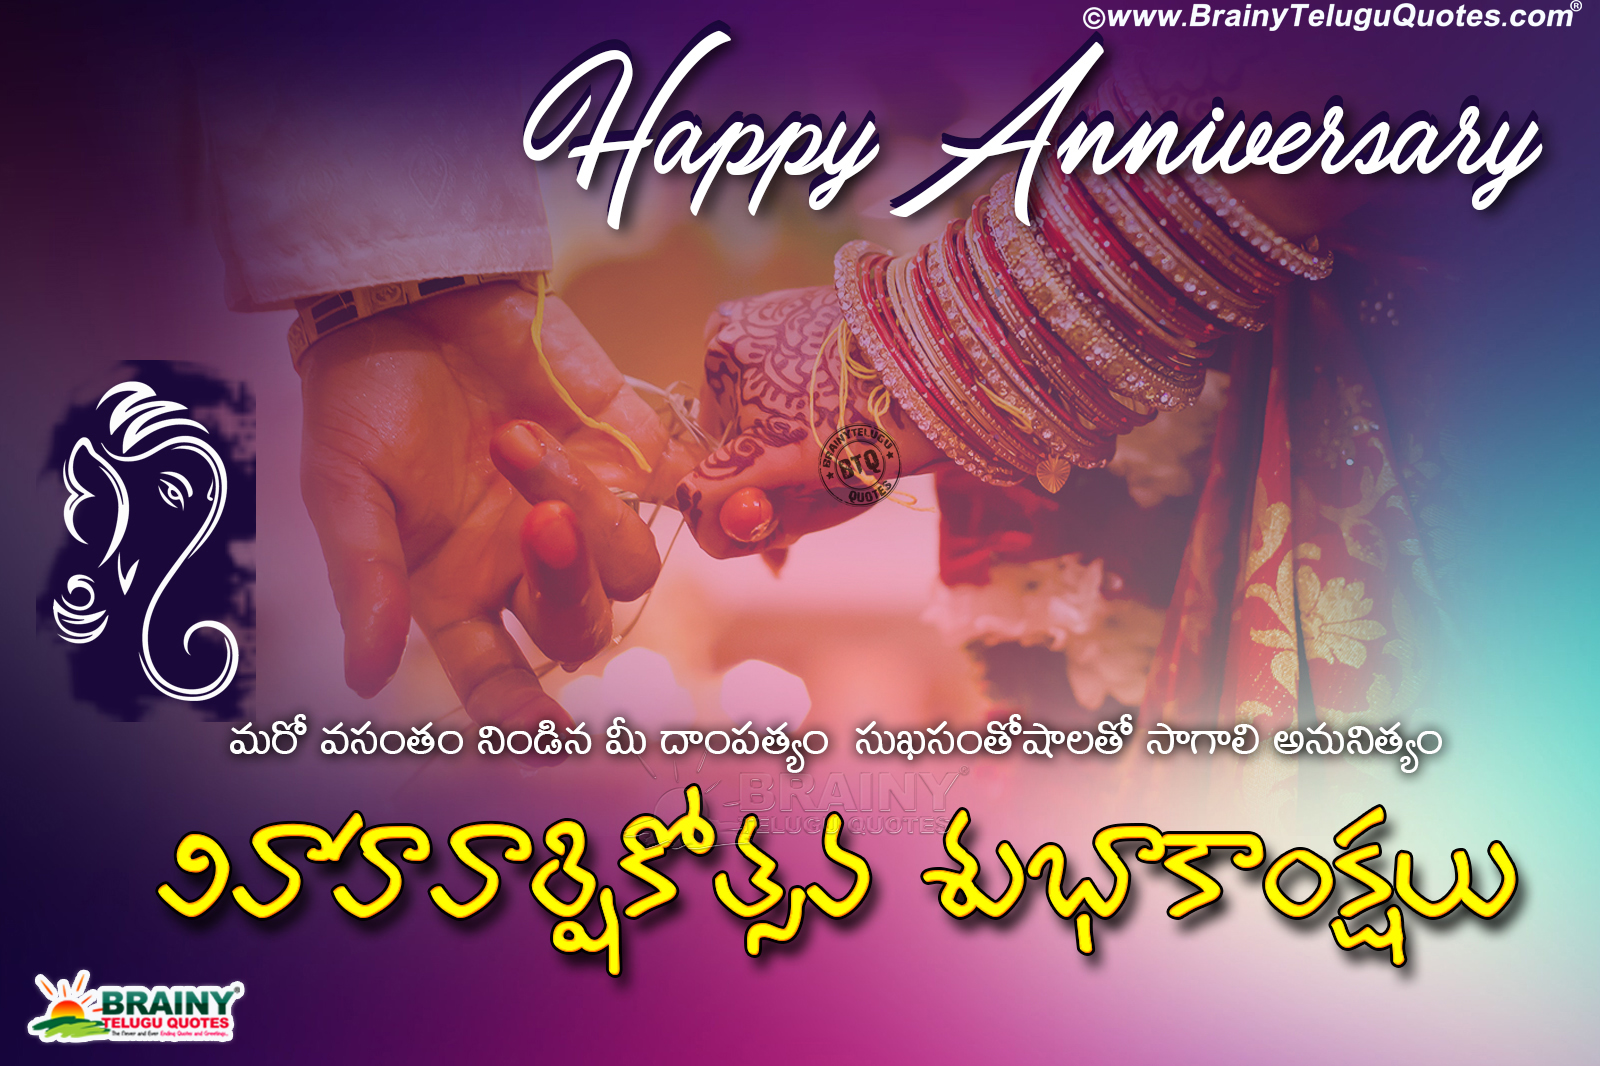 Happy Wedding Anniversary Day Telugu Quotes